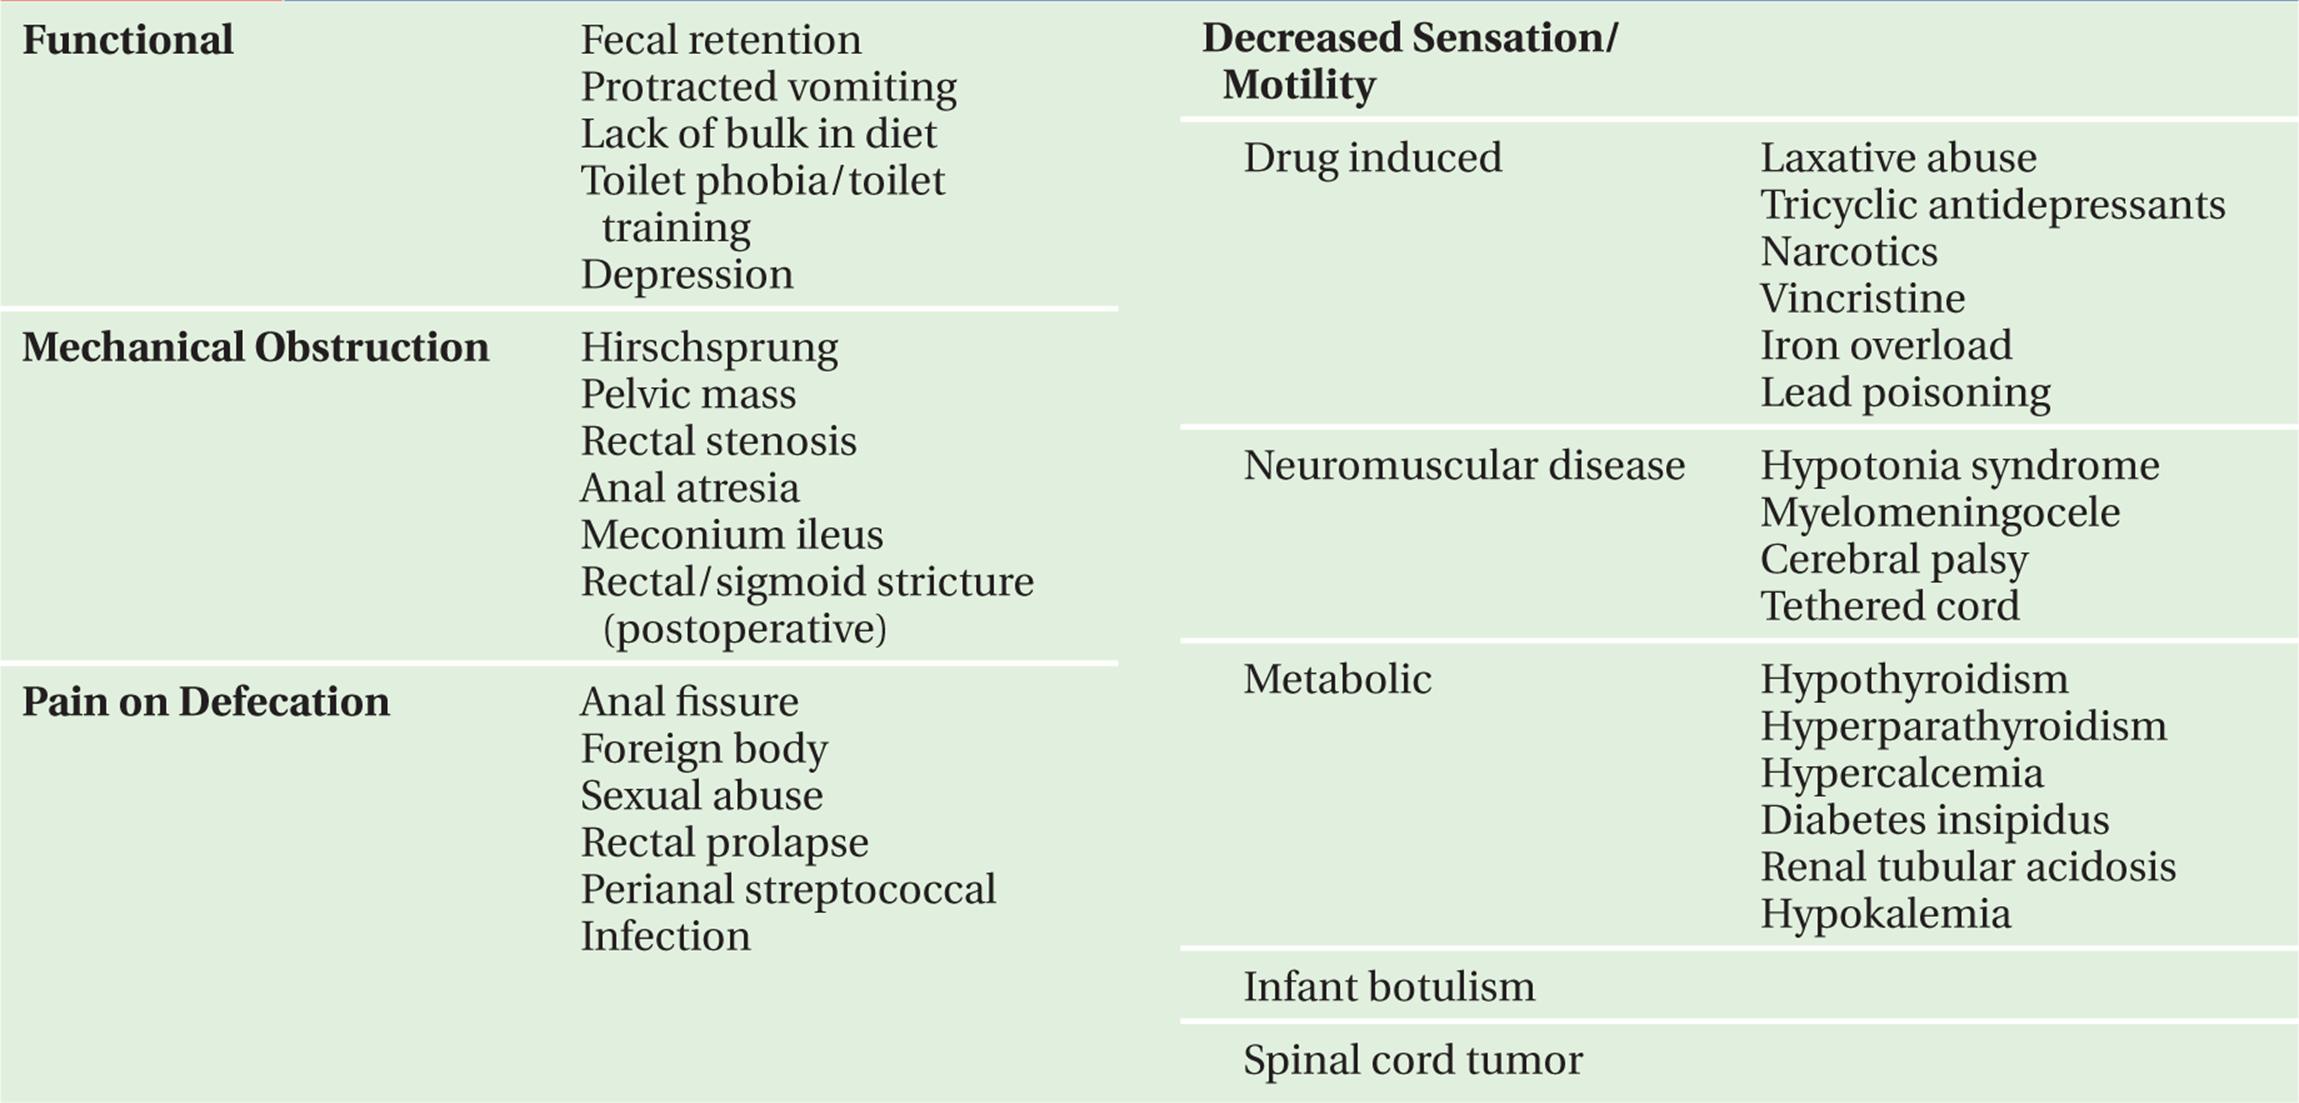 CONSTIPATION - Symptom-Based Diagnosis in Pediatrics (CHOP